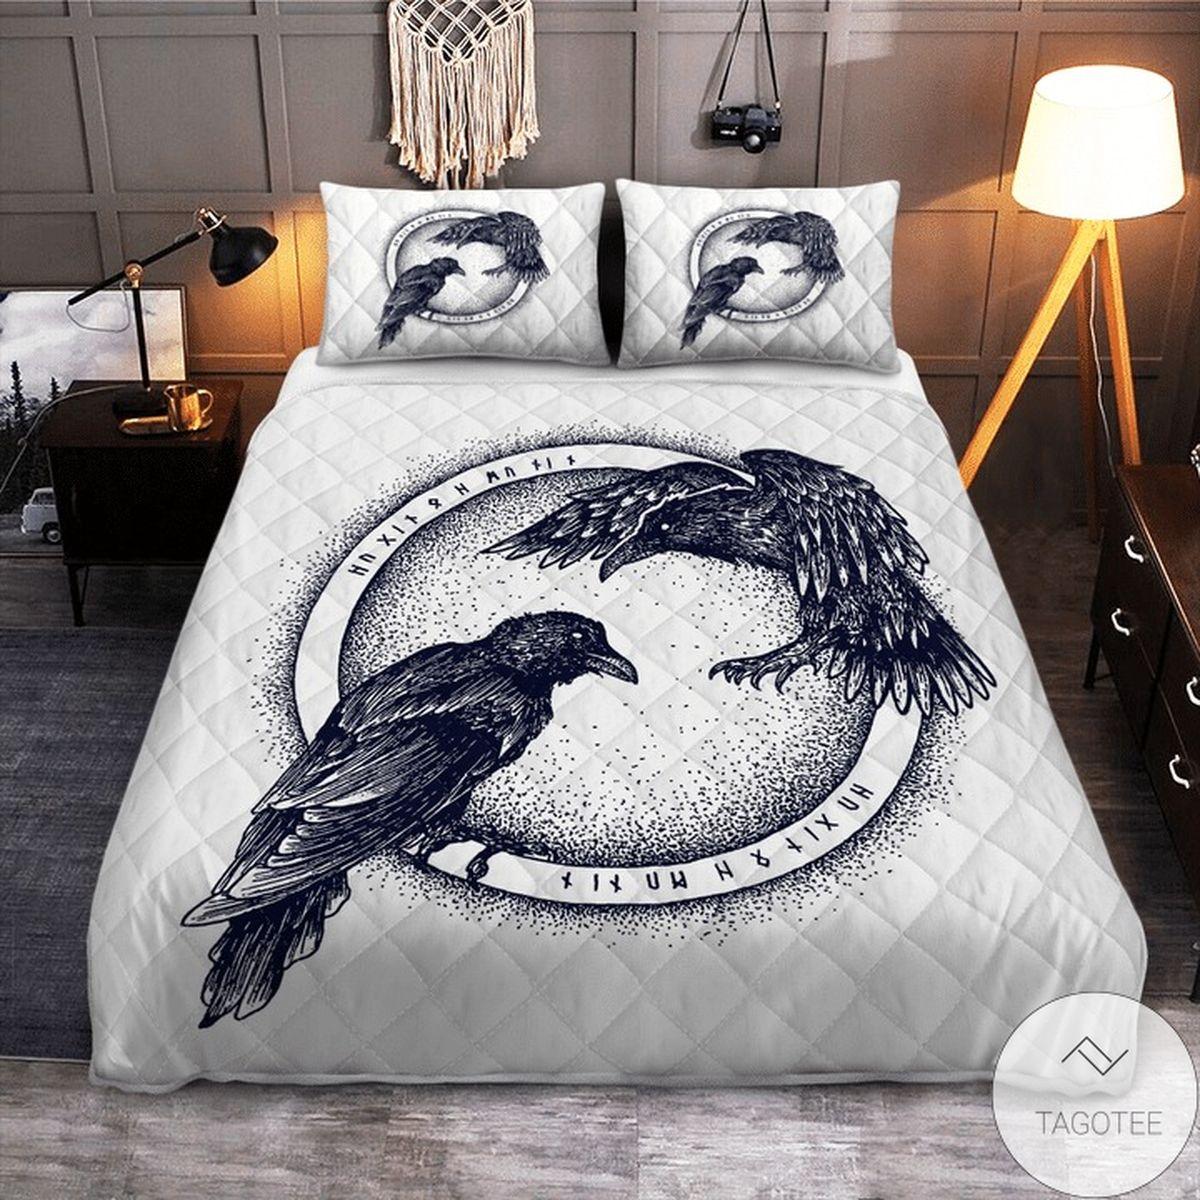 Amazing Raven Of Odin Hugin And Munin Viking Quilt Bedding Set